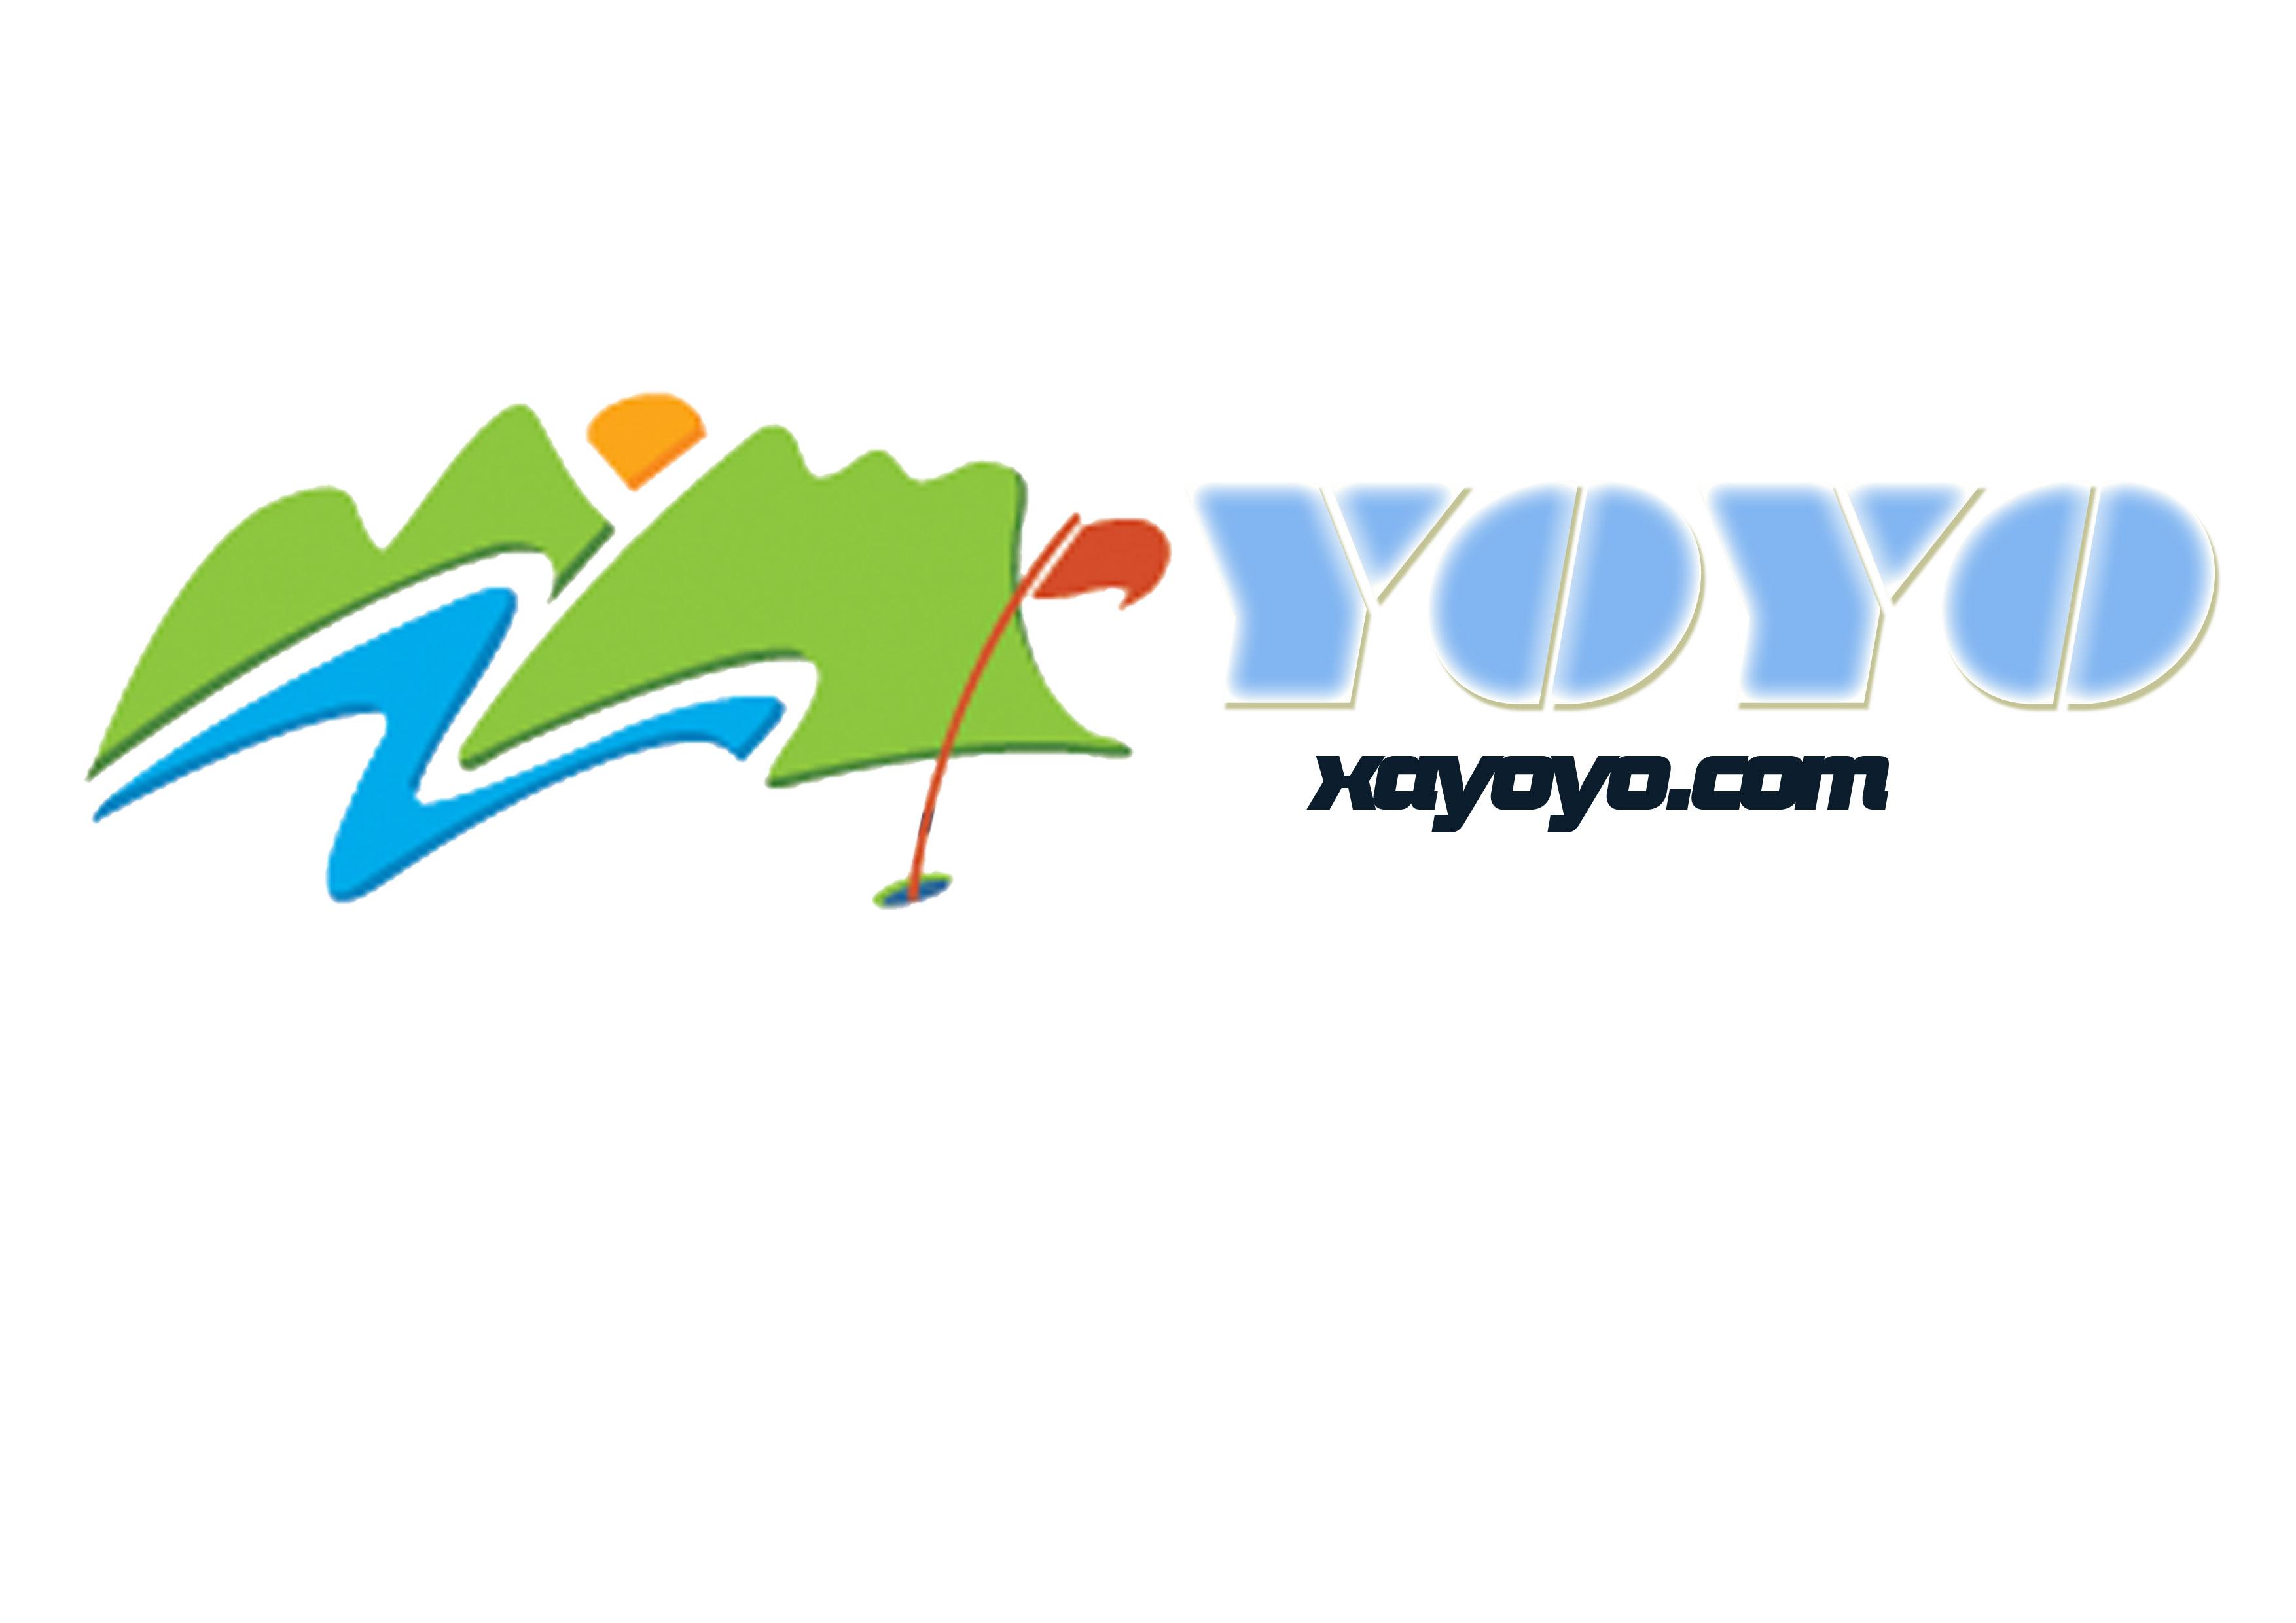 com vi設計內容:標志,標準組合,展板式樣設計 logo:yoyo 中文:悠游之